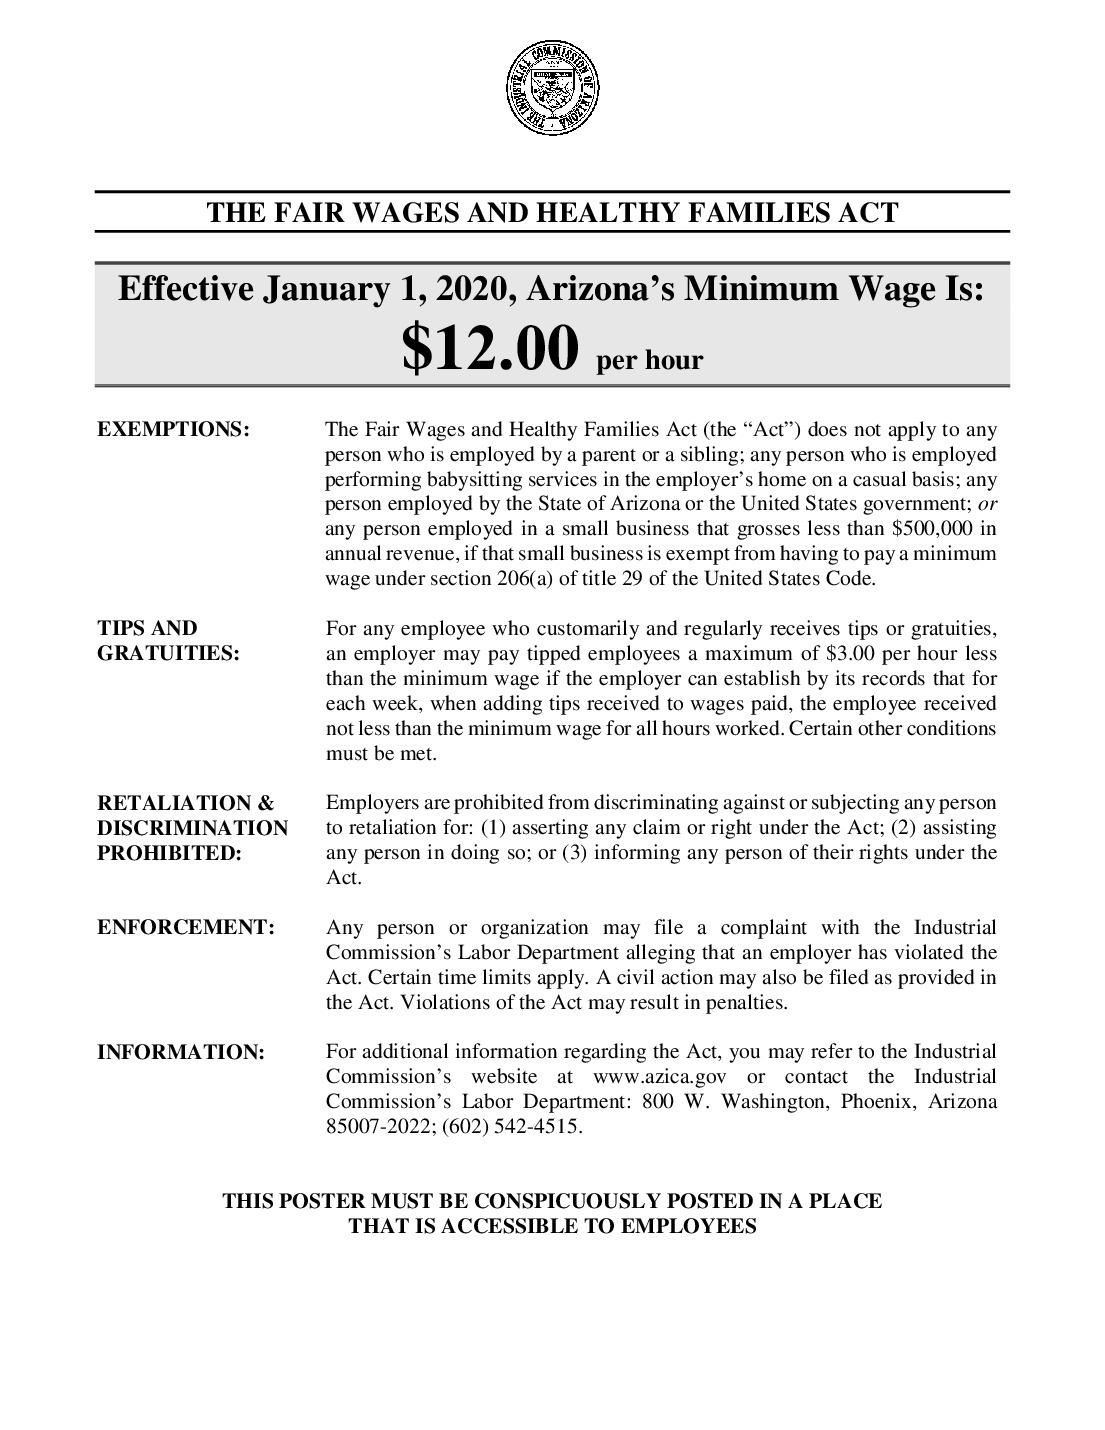 free arizona minimum wage 2021